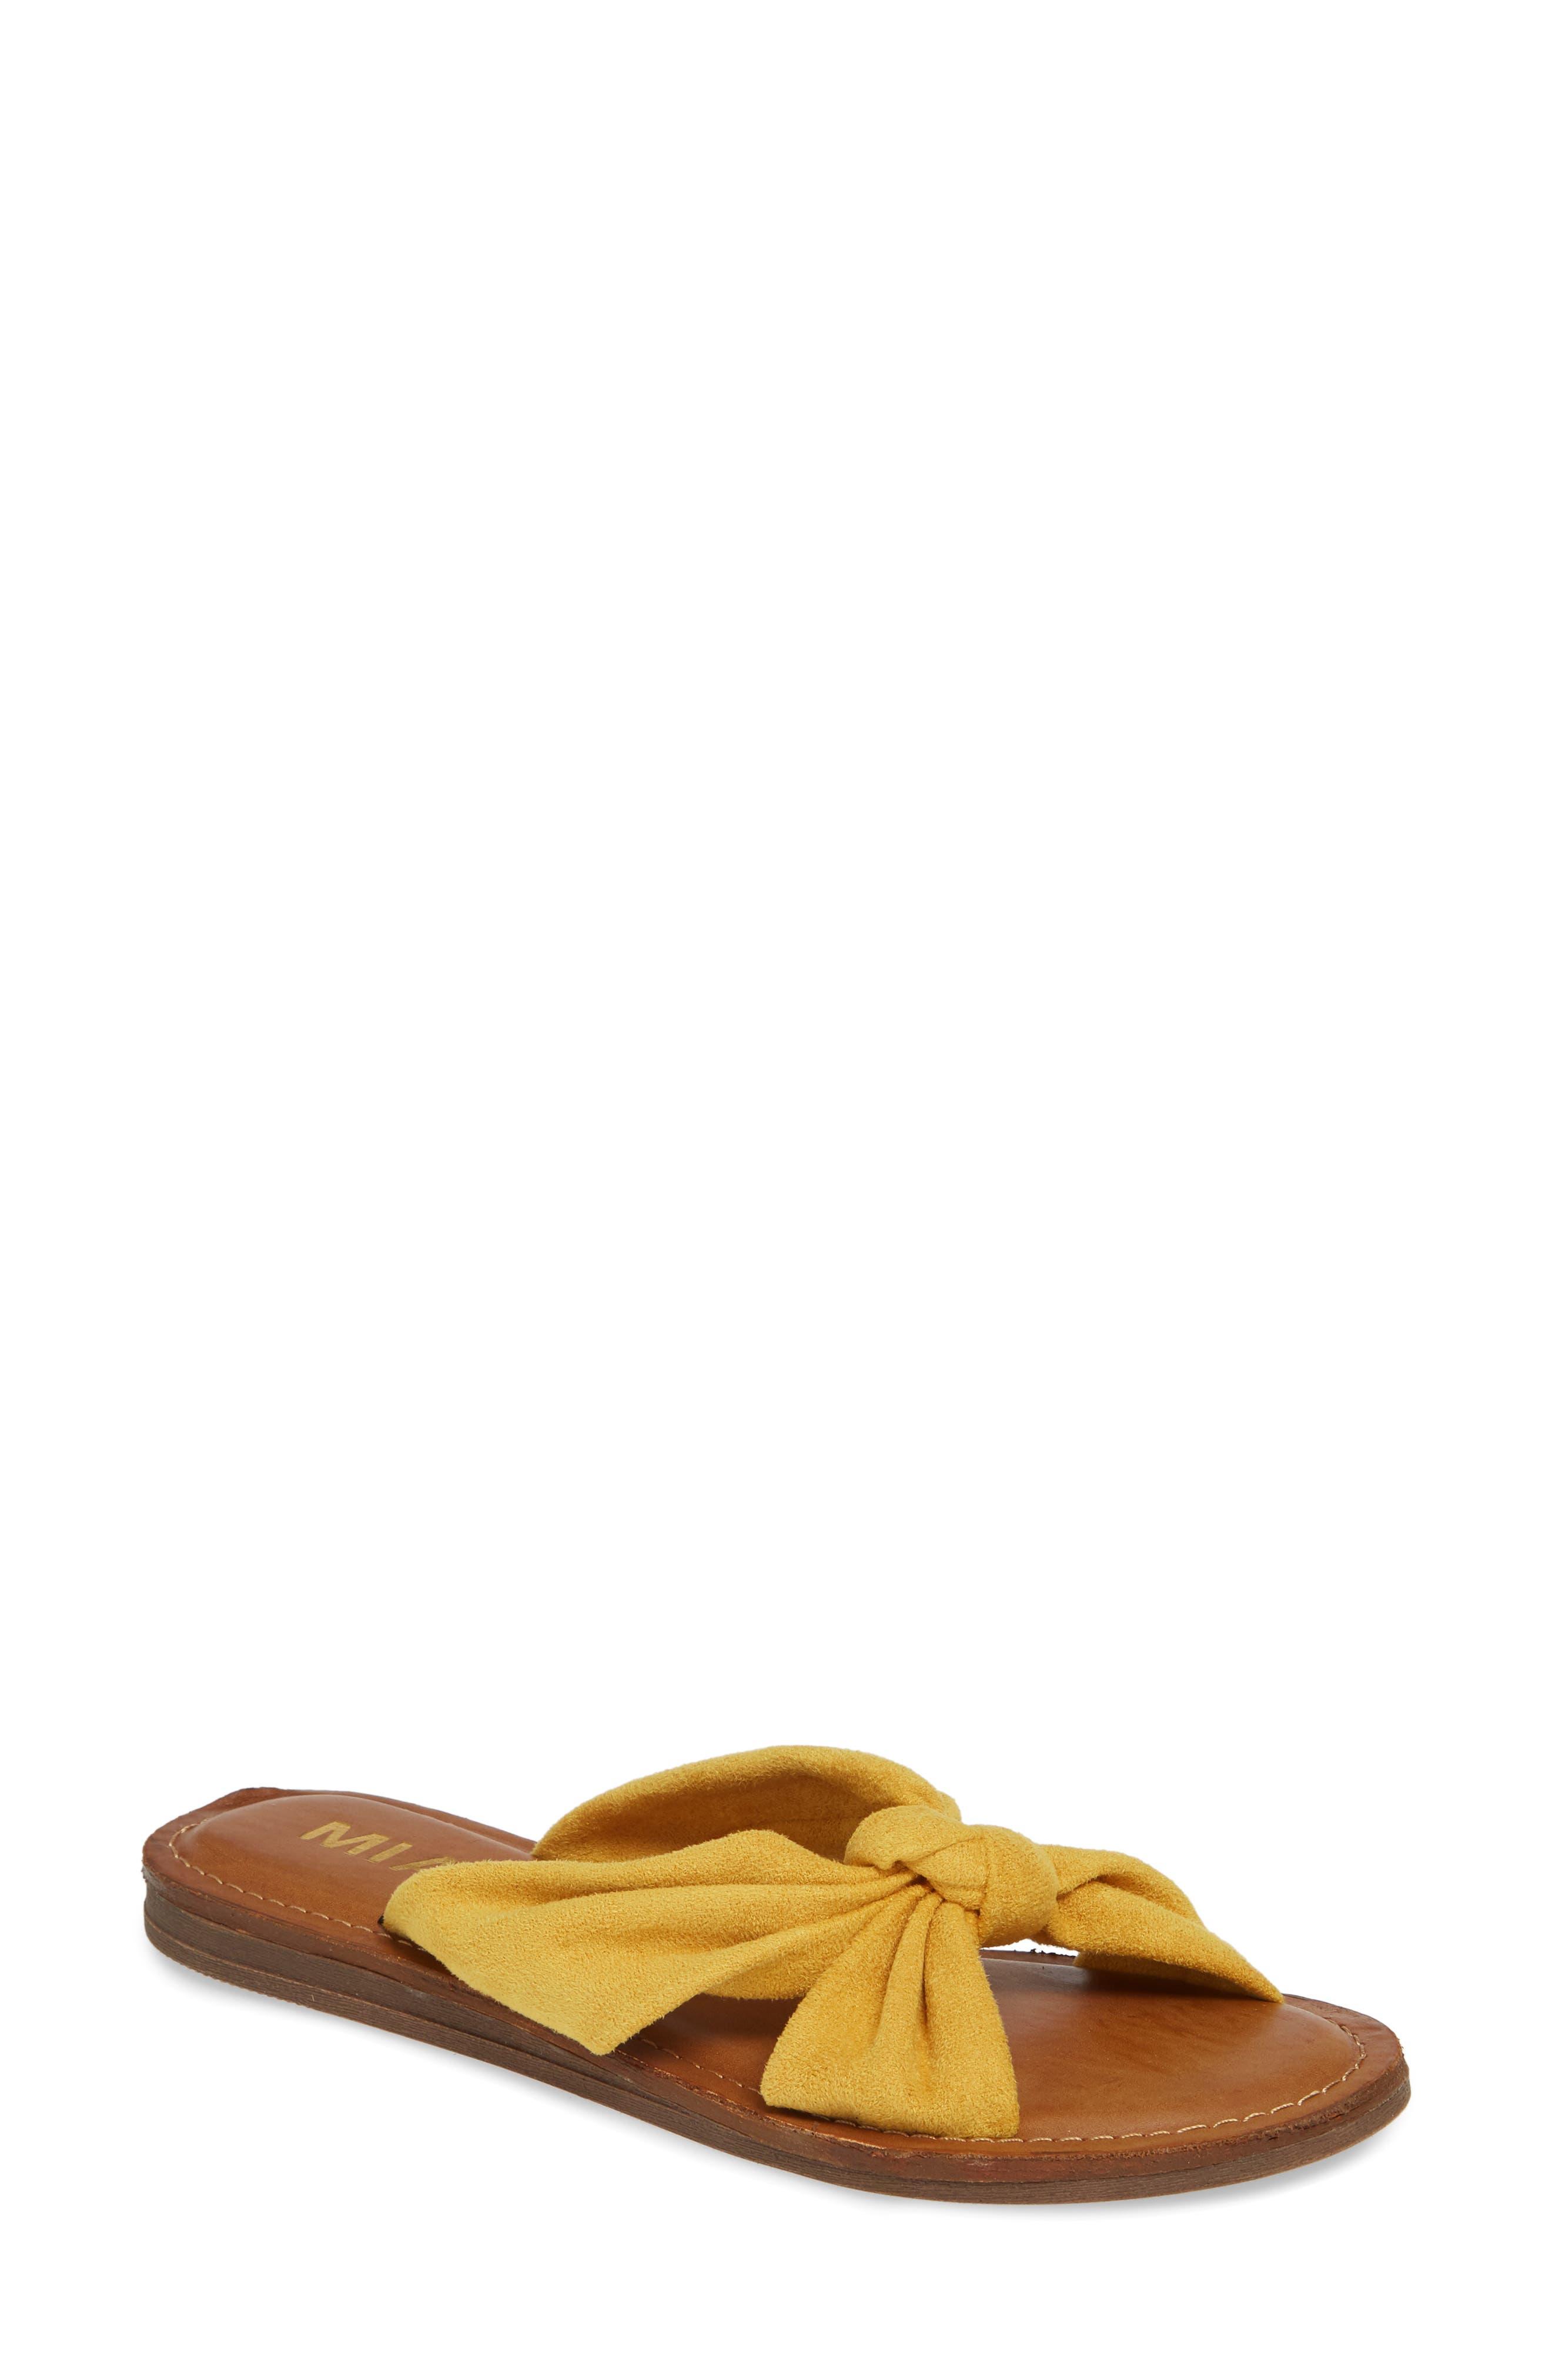 Mia Emila Slide Sandal, Yellow